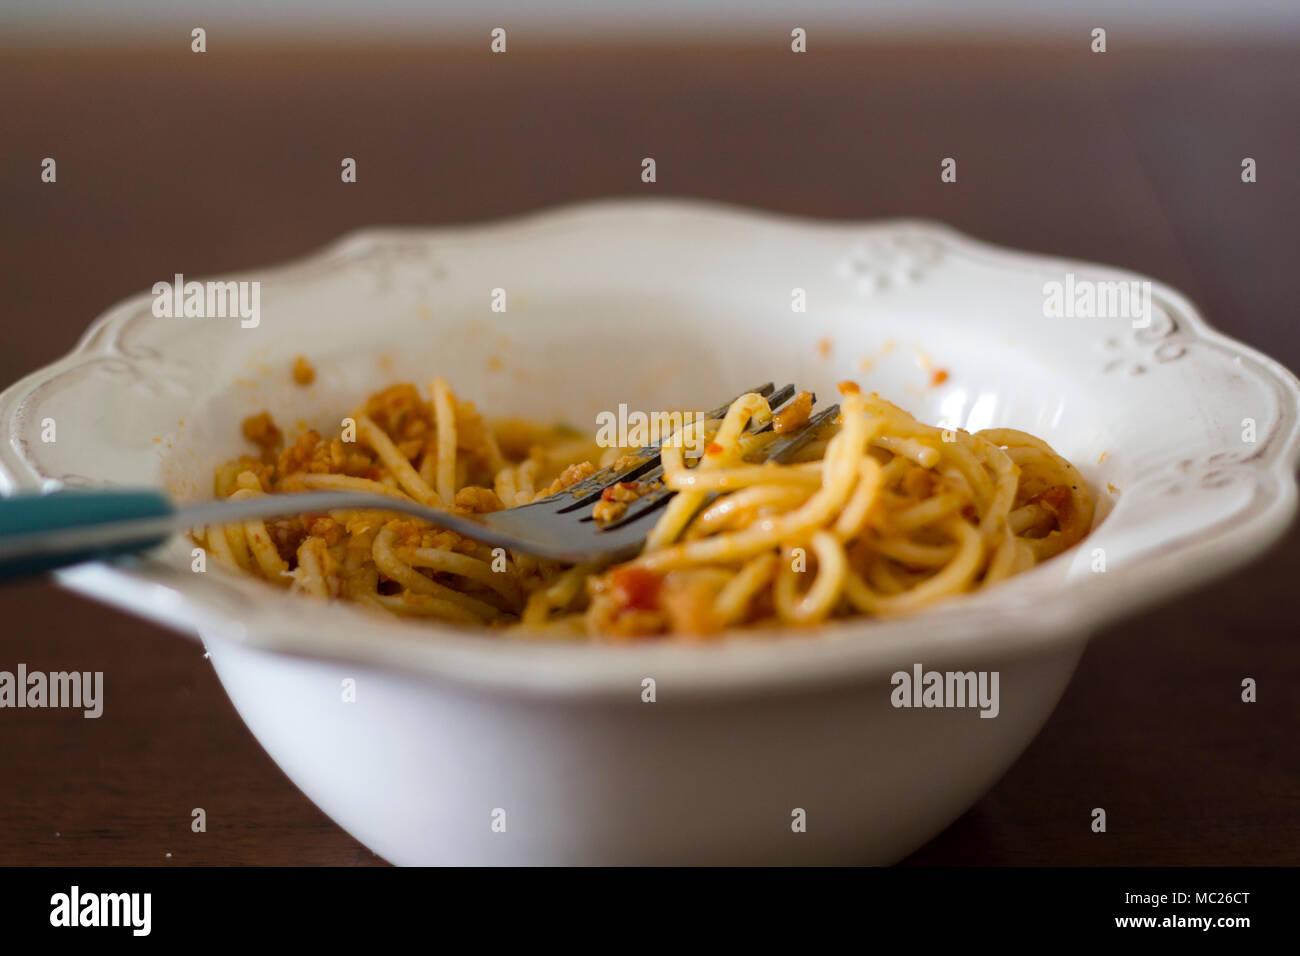 Schüssel spaghetti Pasta mit Gabel oben Stockfoto